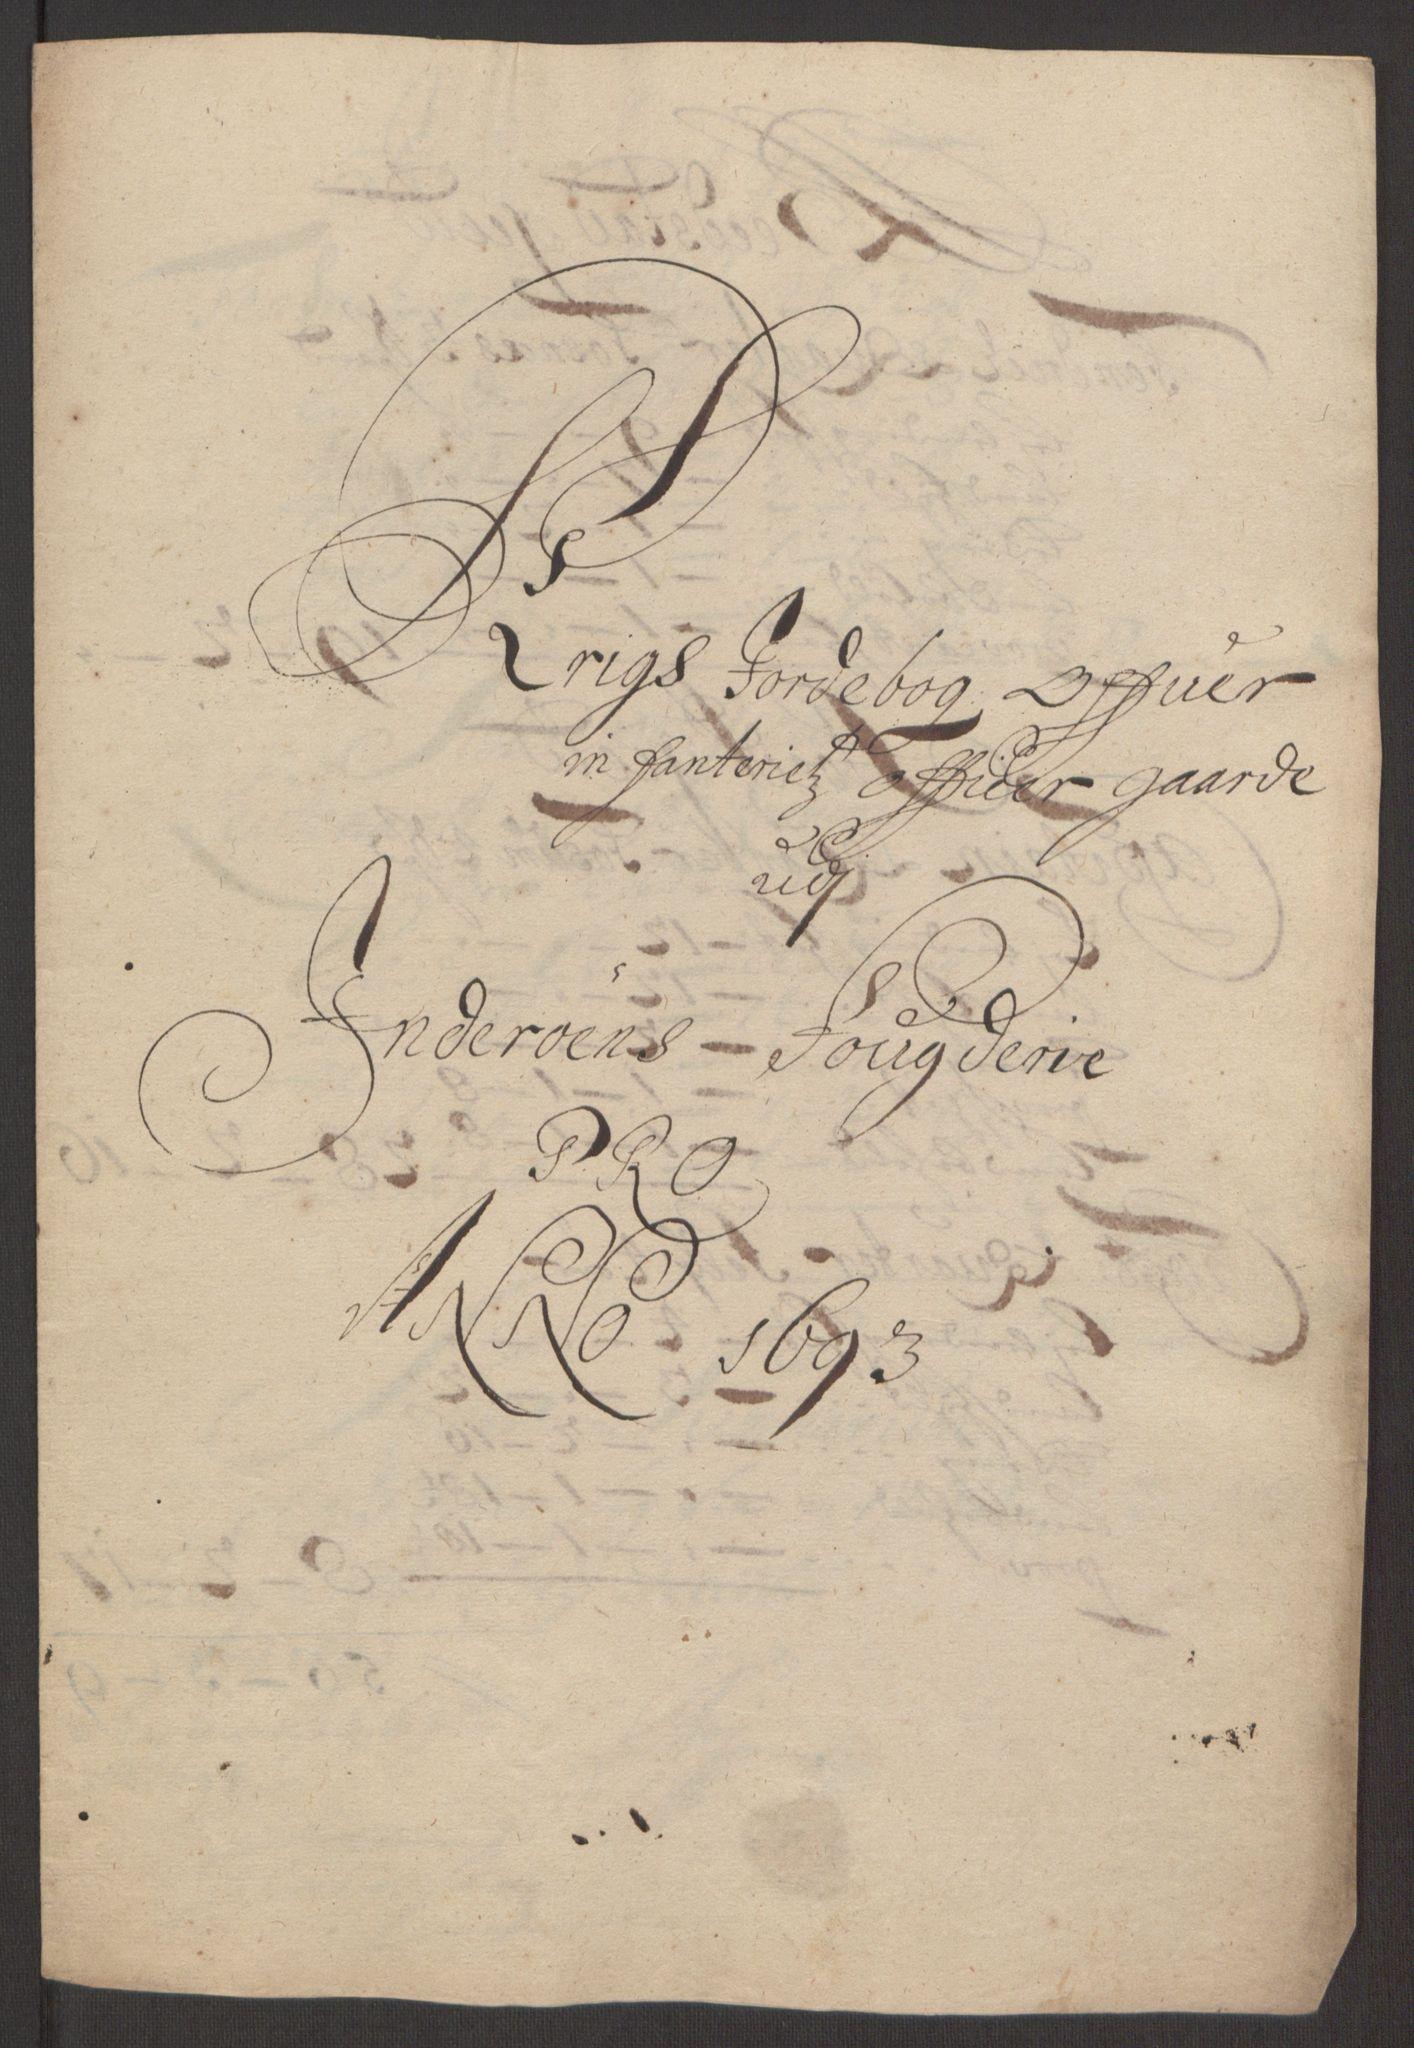 RA, Rentekammeret inntil 1814, Reviderte regnskaper, Fogderegnskap, R63/L4308: Fogderegnskap Inderøy, 1692-1694, s. 511